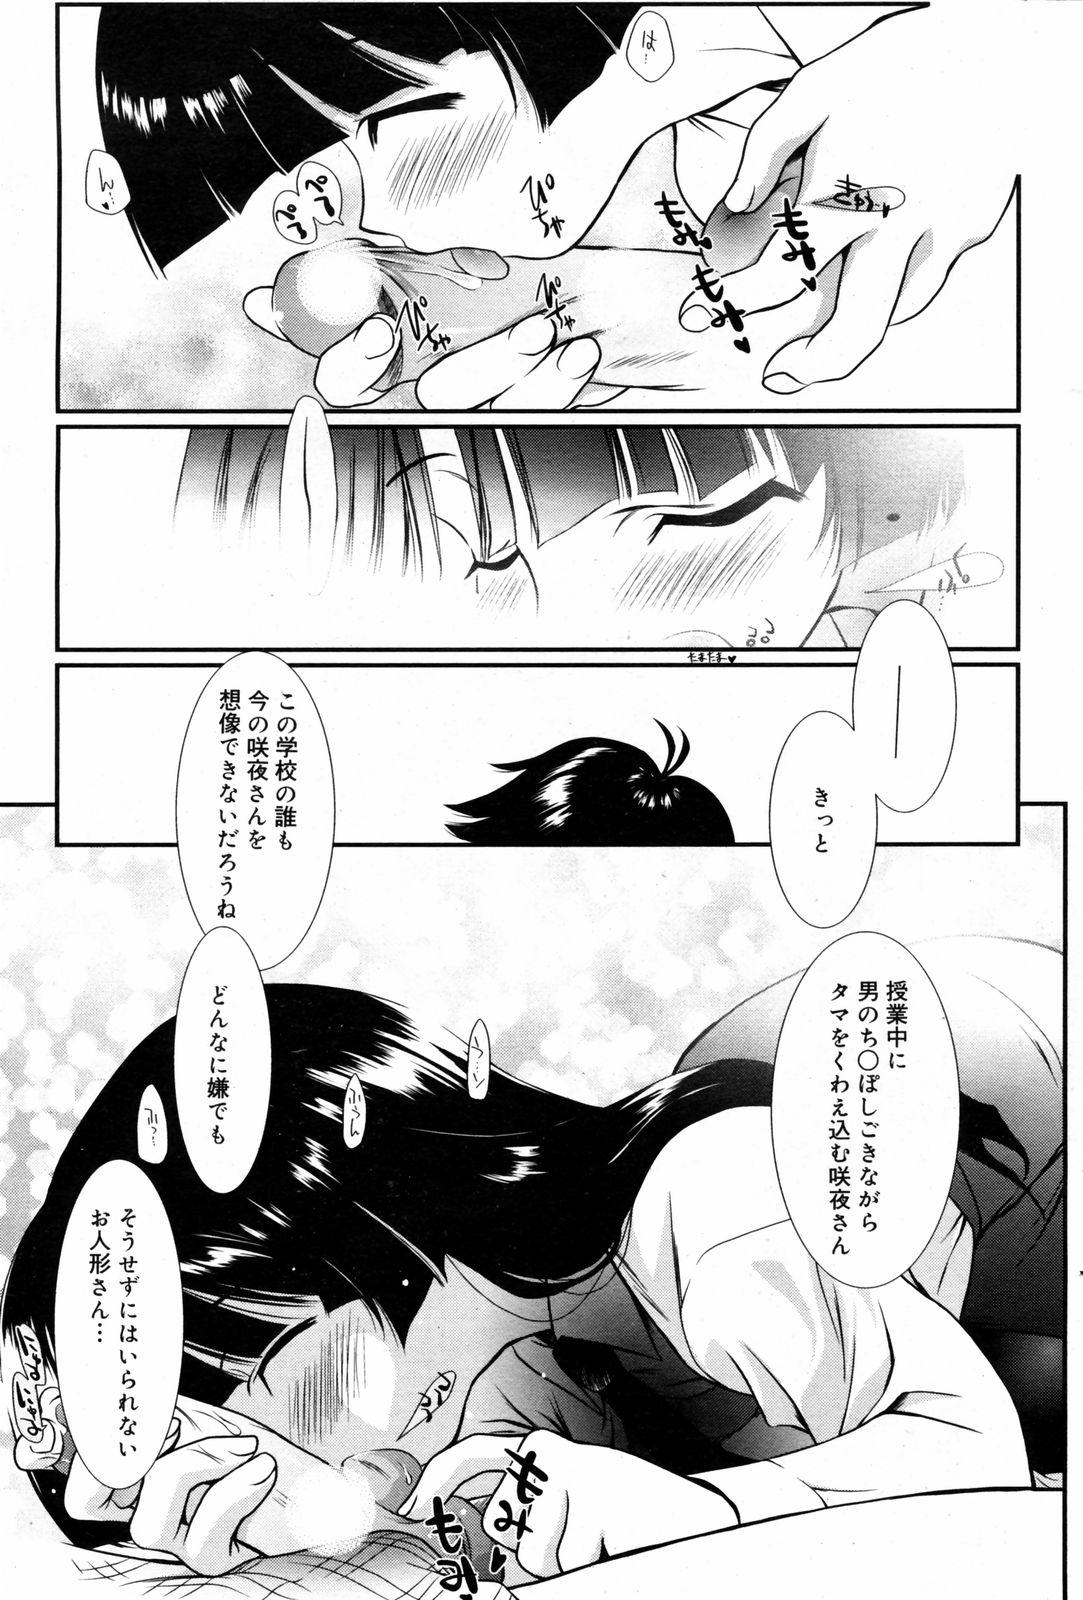 Manga Bangaichi 2008-03 66